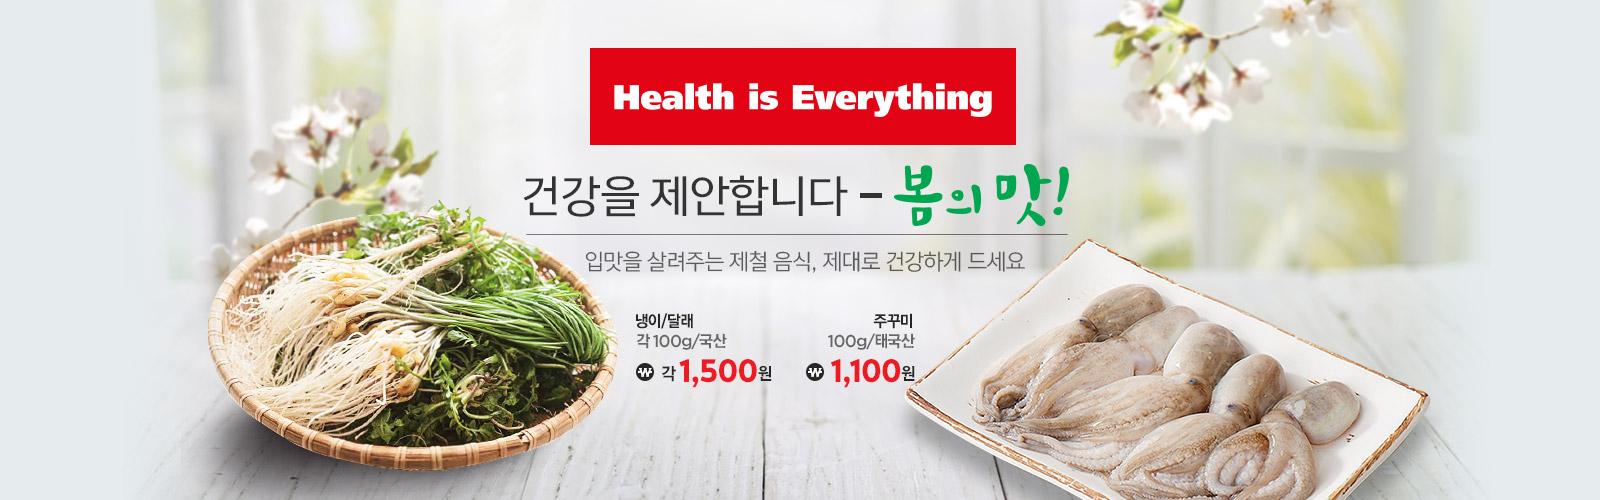 Health is Everything 건강을 제안합니다- 봄의맛! 입맛을 살려주슨 제철 음식, 제대로 건강하게 드세요